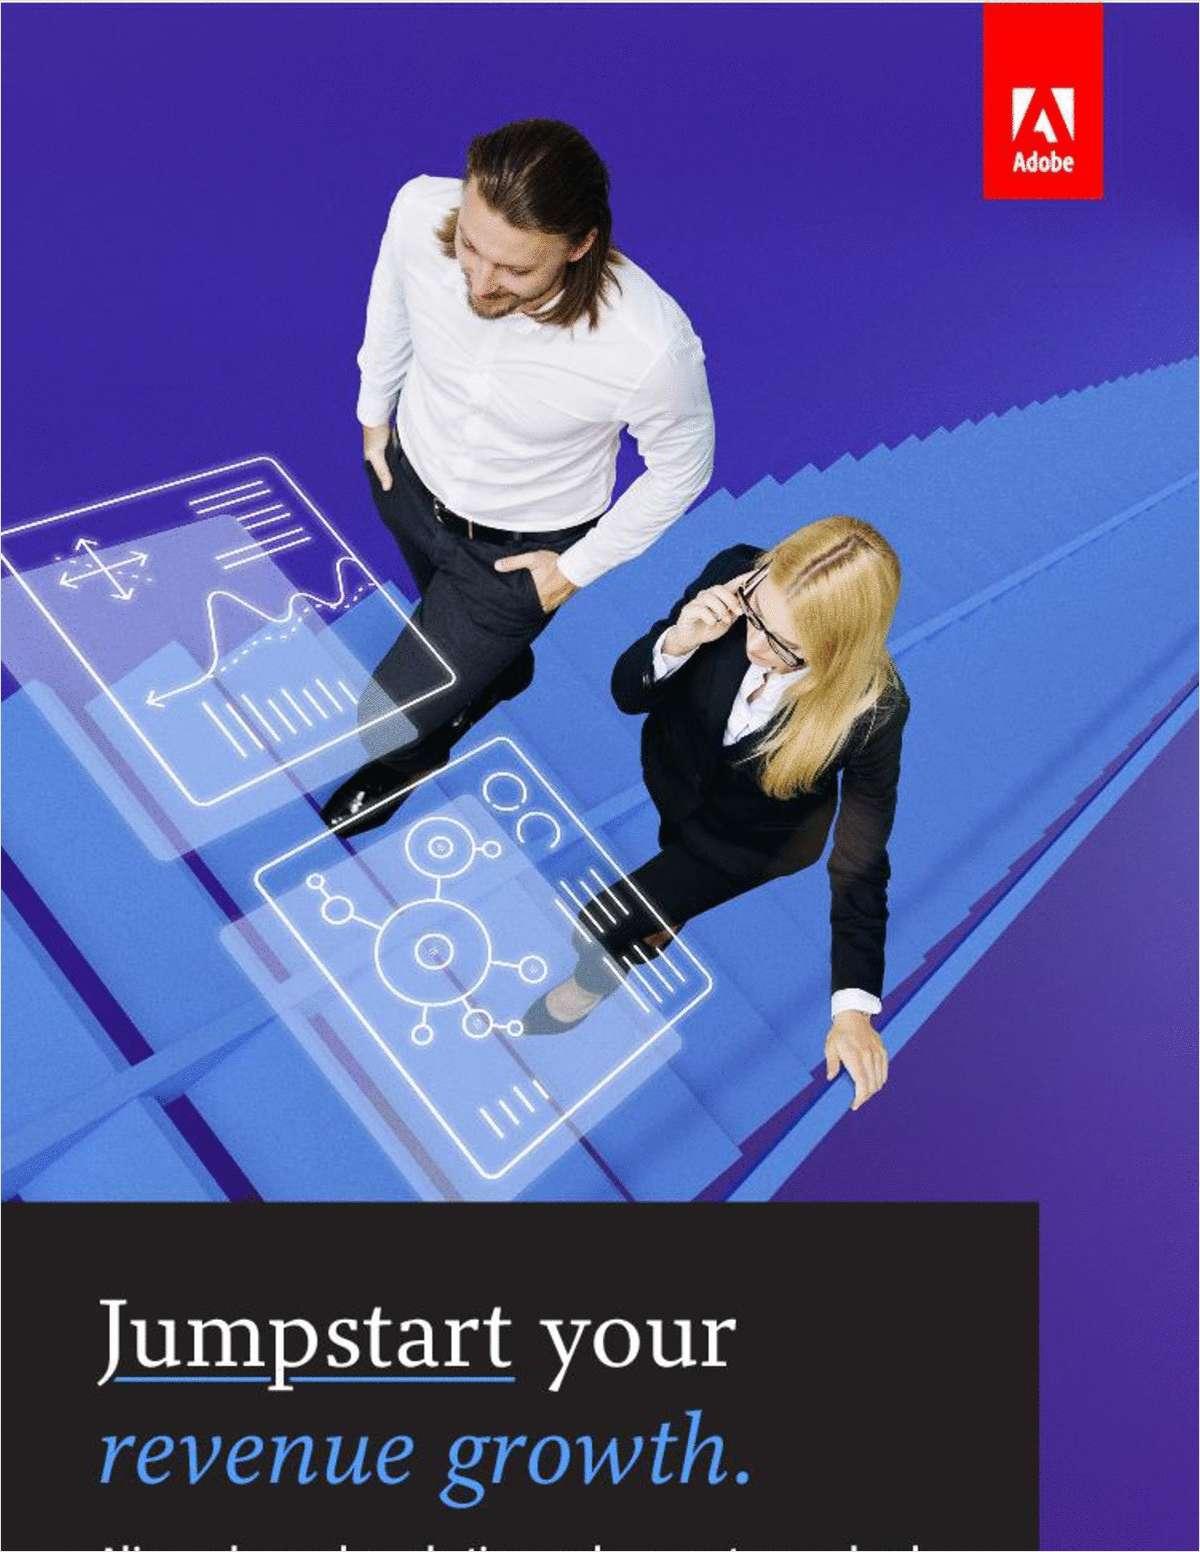 Jumpstart Your Revenue Growth